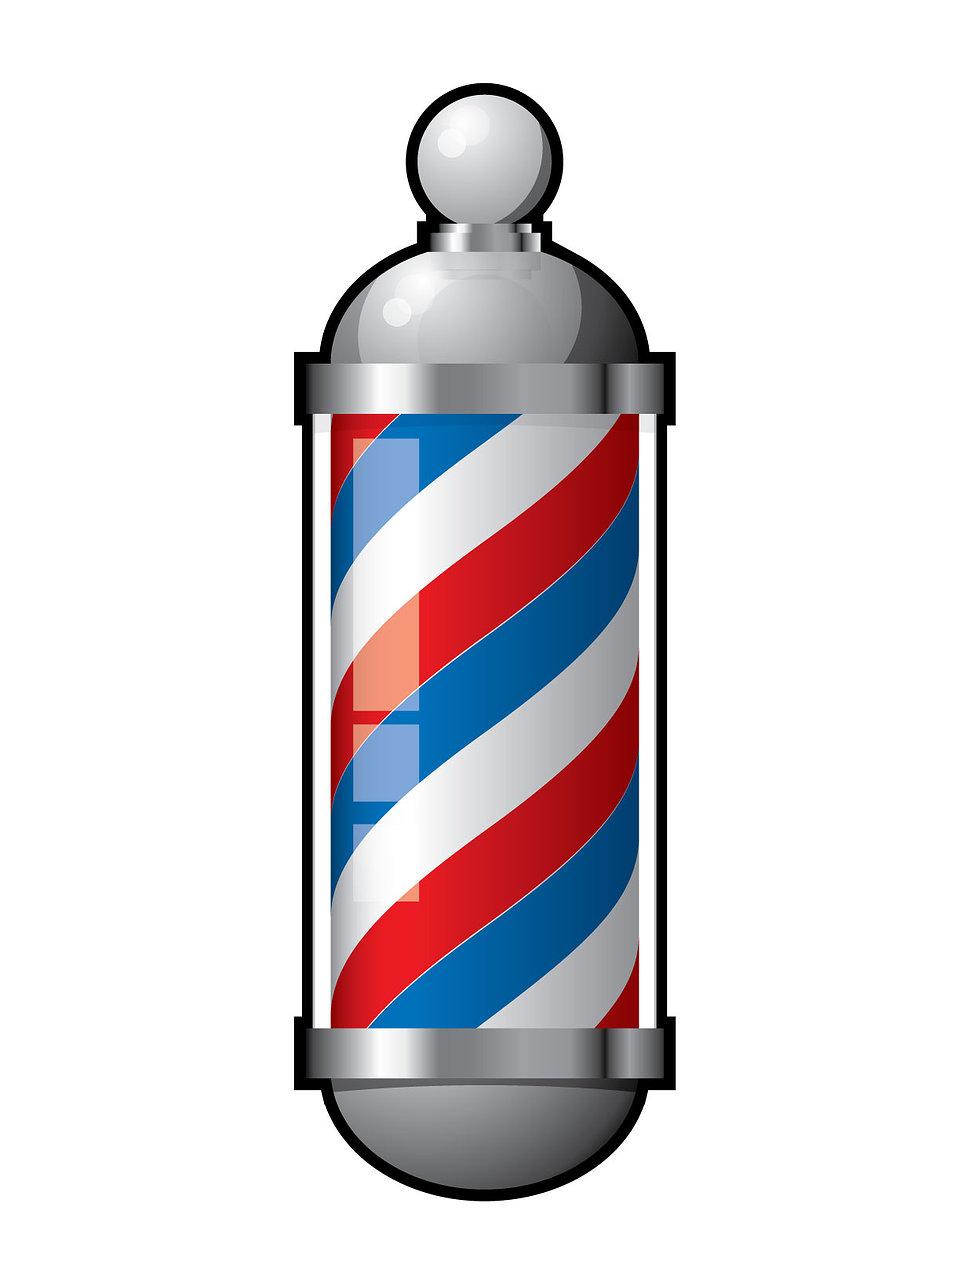 Animated Barber Pole Lockharts Barbe...